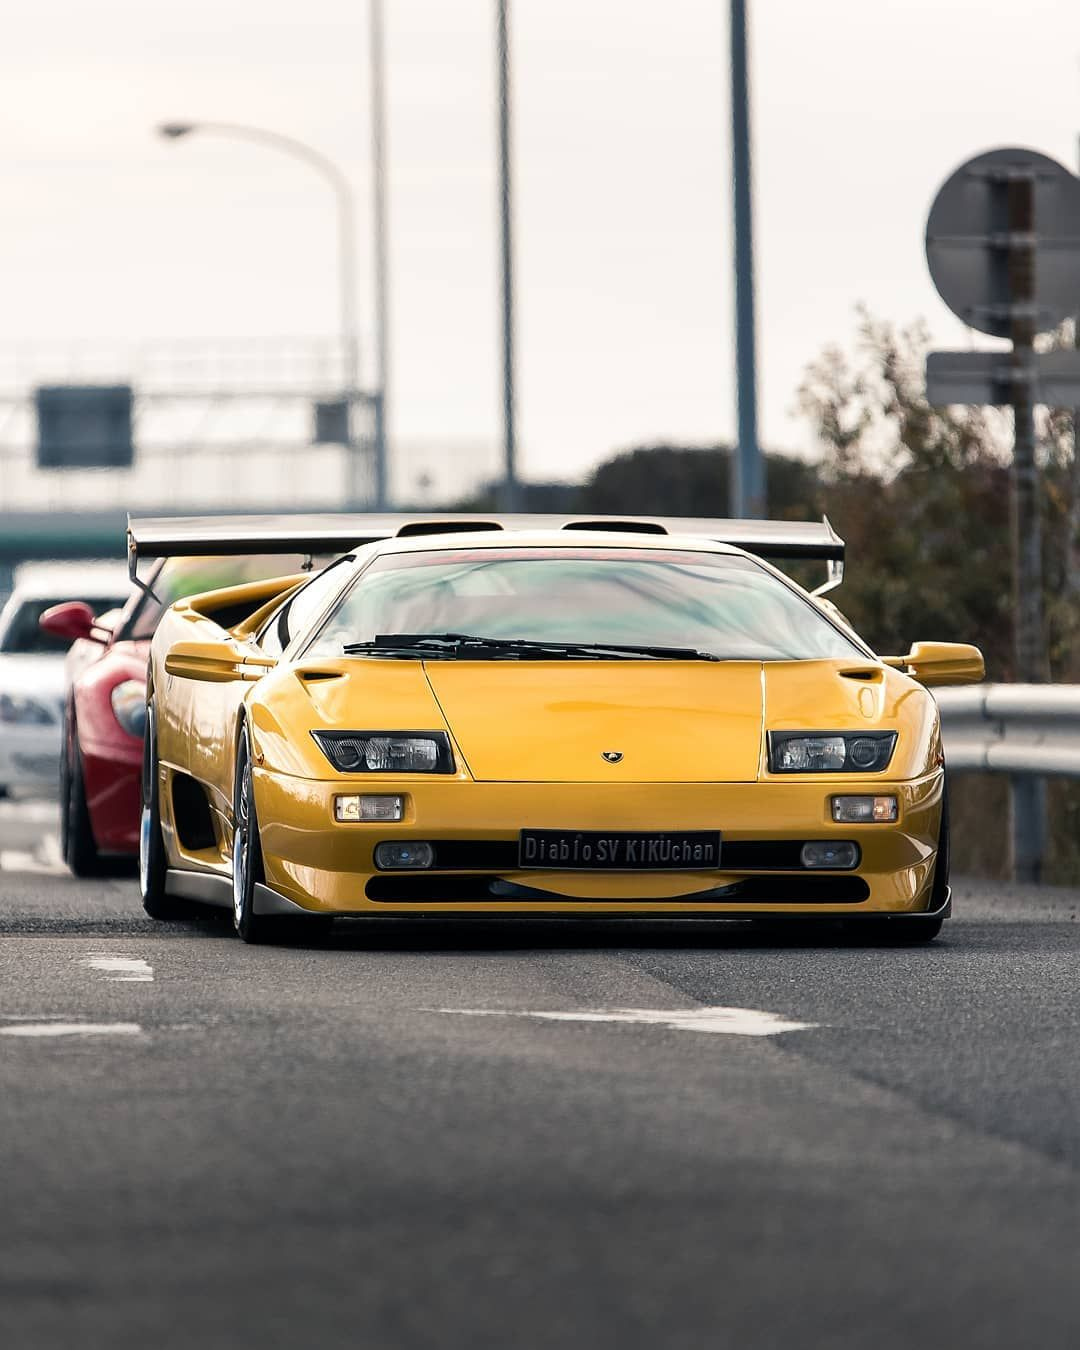 Diablo Sv After Undergoing Some Japanese Surgery Lamborghini